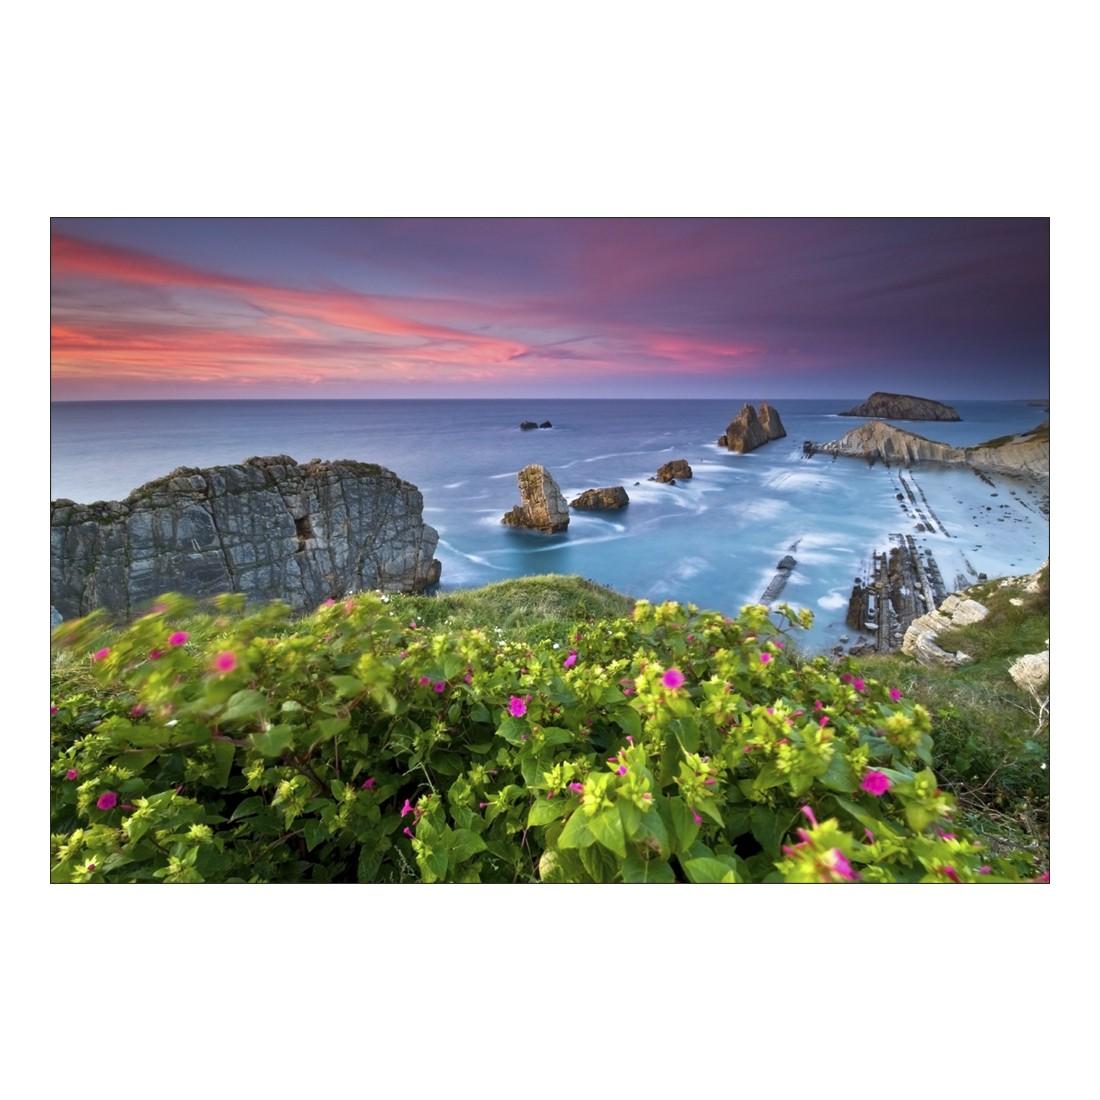 Acrylglasbild Blue Coast in Sunset – Abmessung 30×20 cm, Gallery of Innovative Art günstig